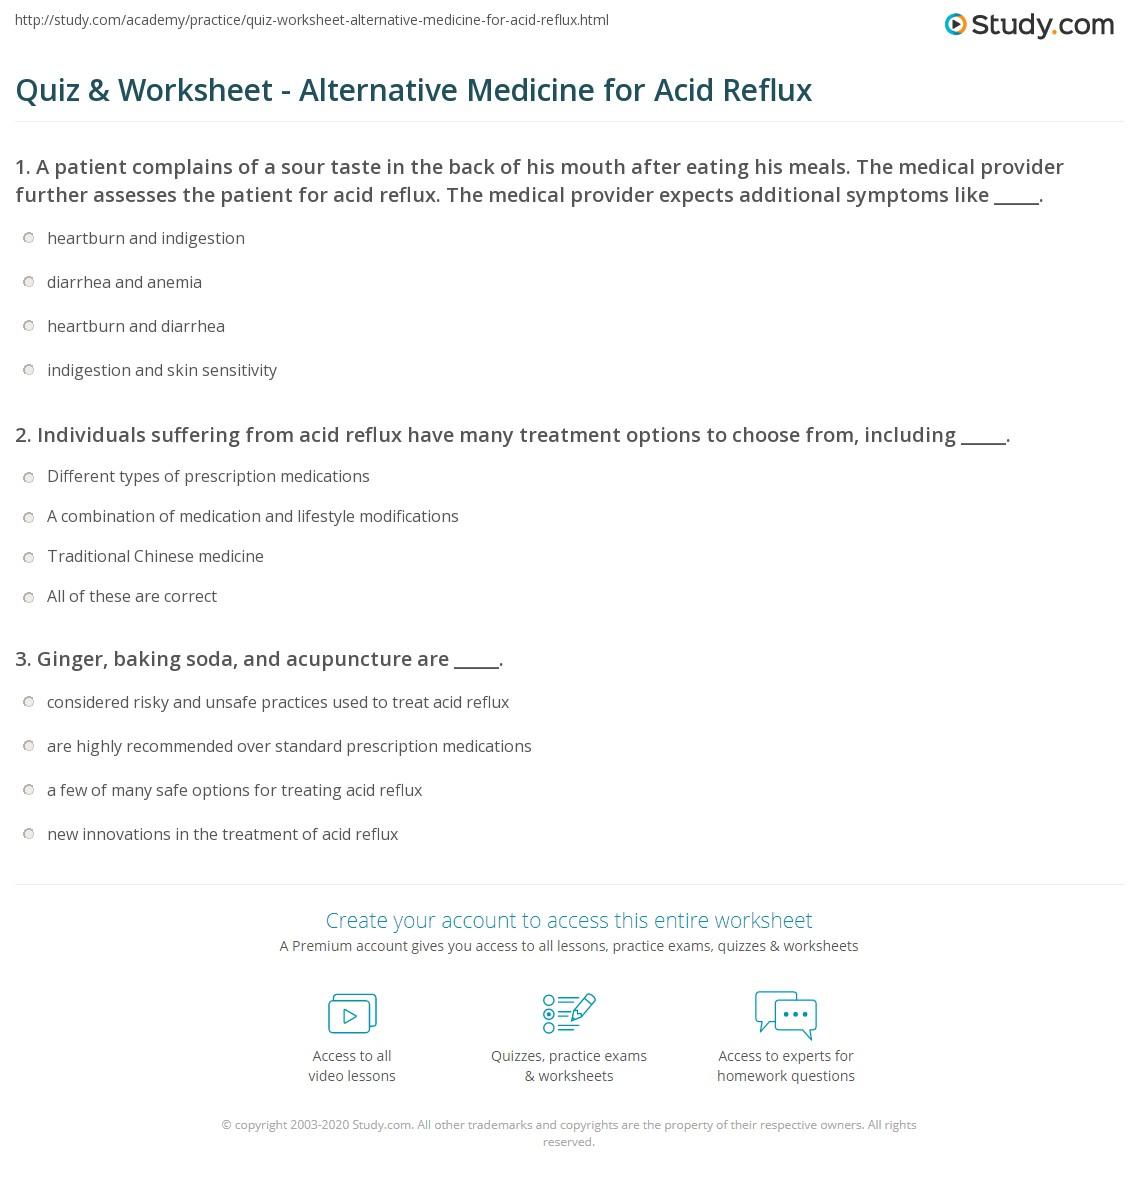 Quiz & Worksheet - Alternative Medicine for Acid Reflux | Study com